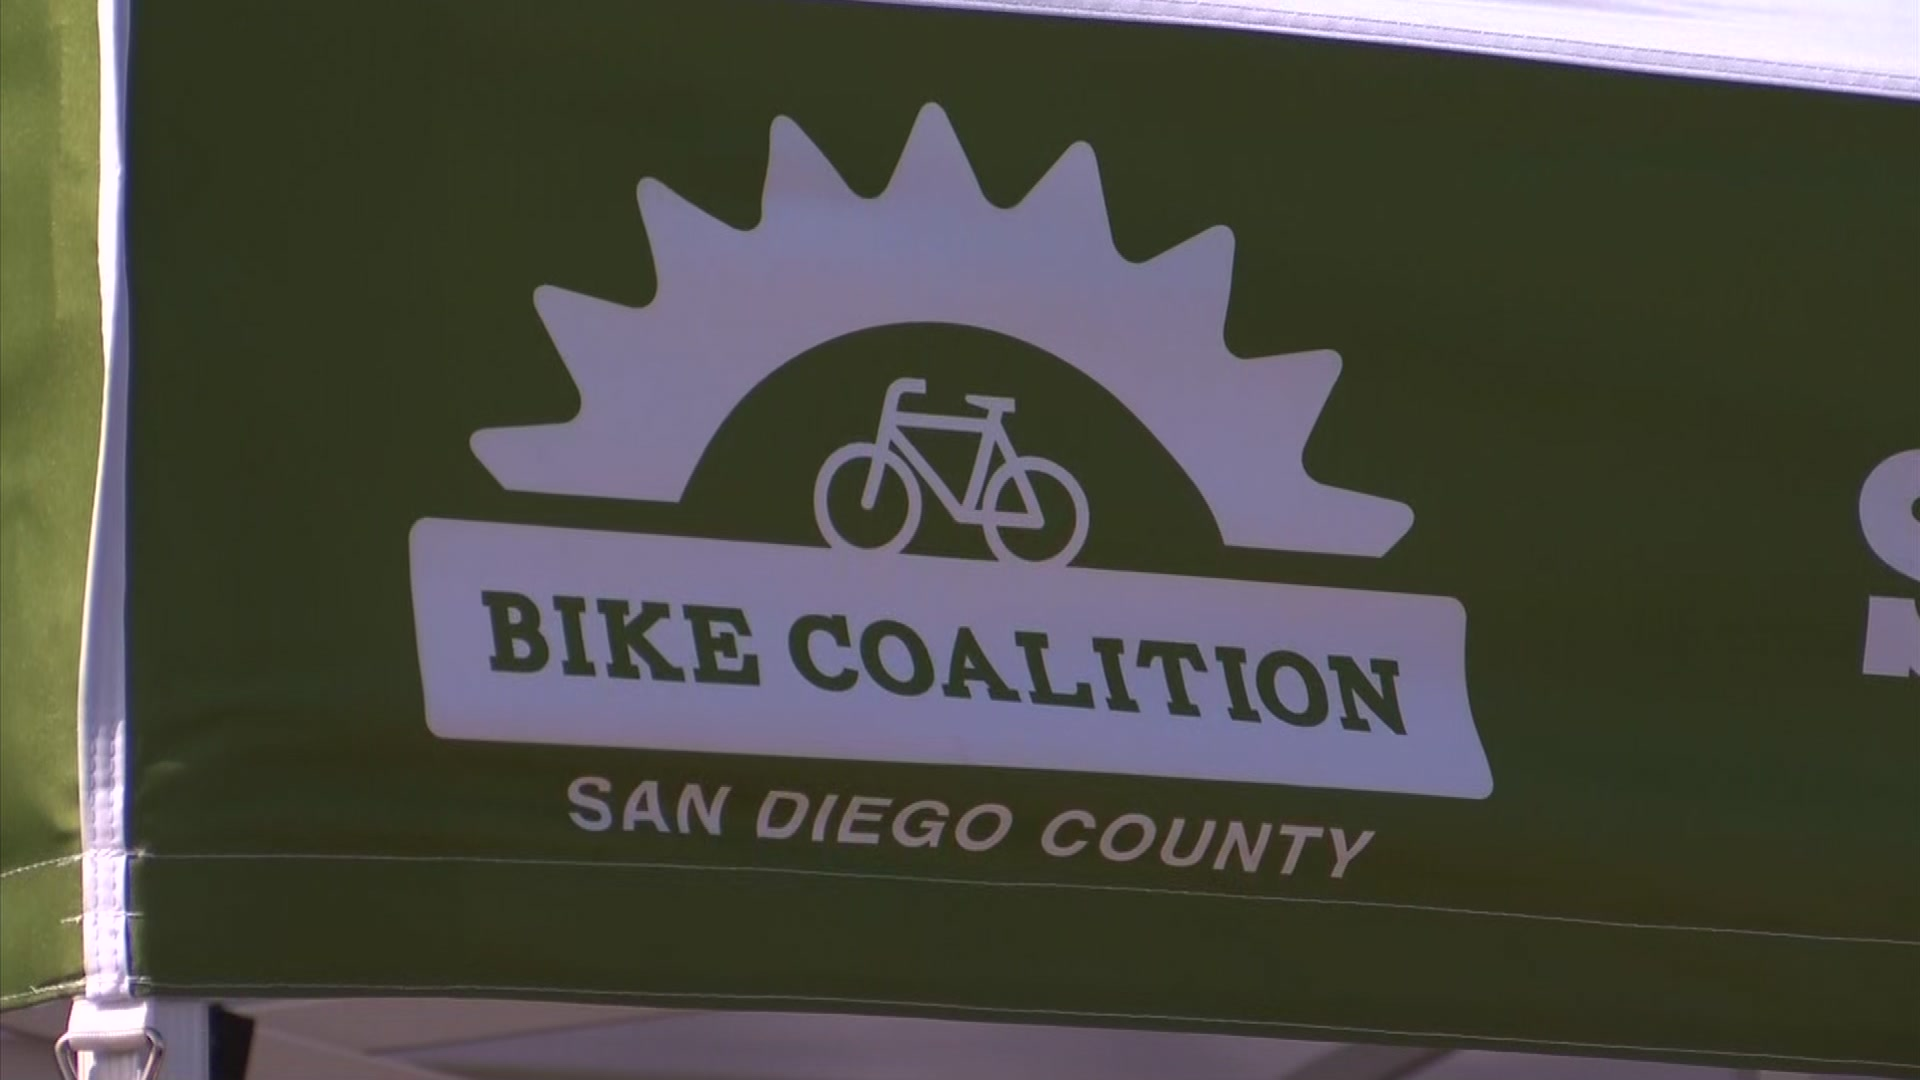 San Diego County Bicycle Coalition Kicks Off Semi-Virtual Scavenger Hunt